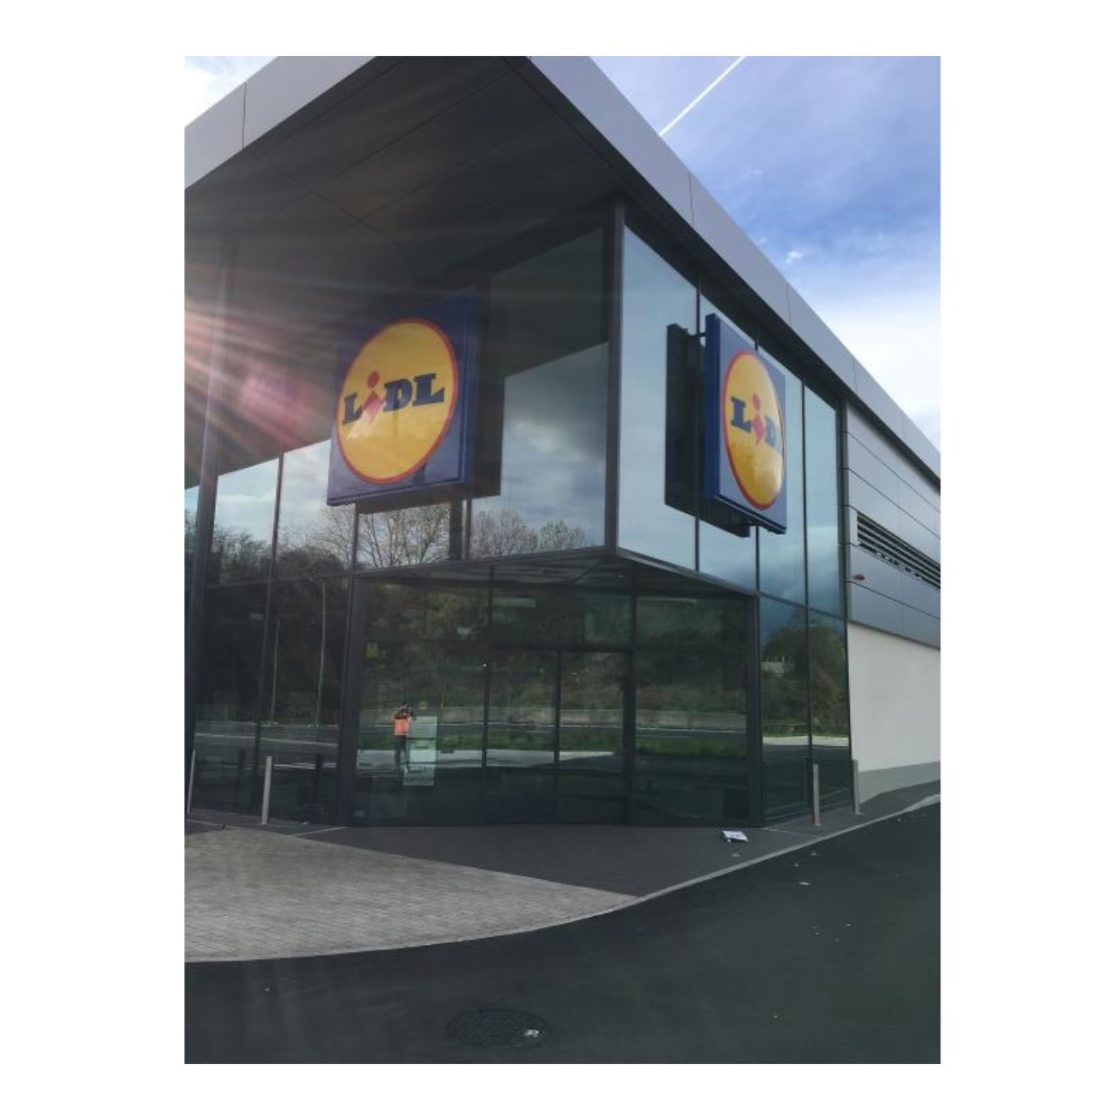 Supermercado LIDL en Galdakao